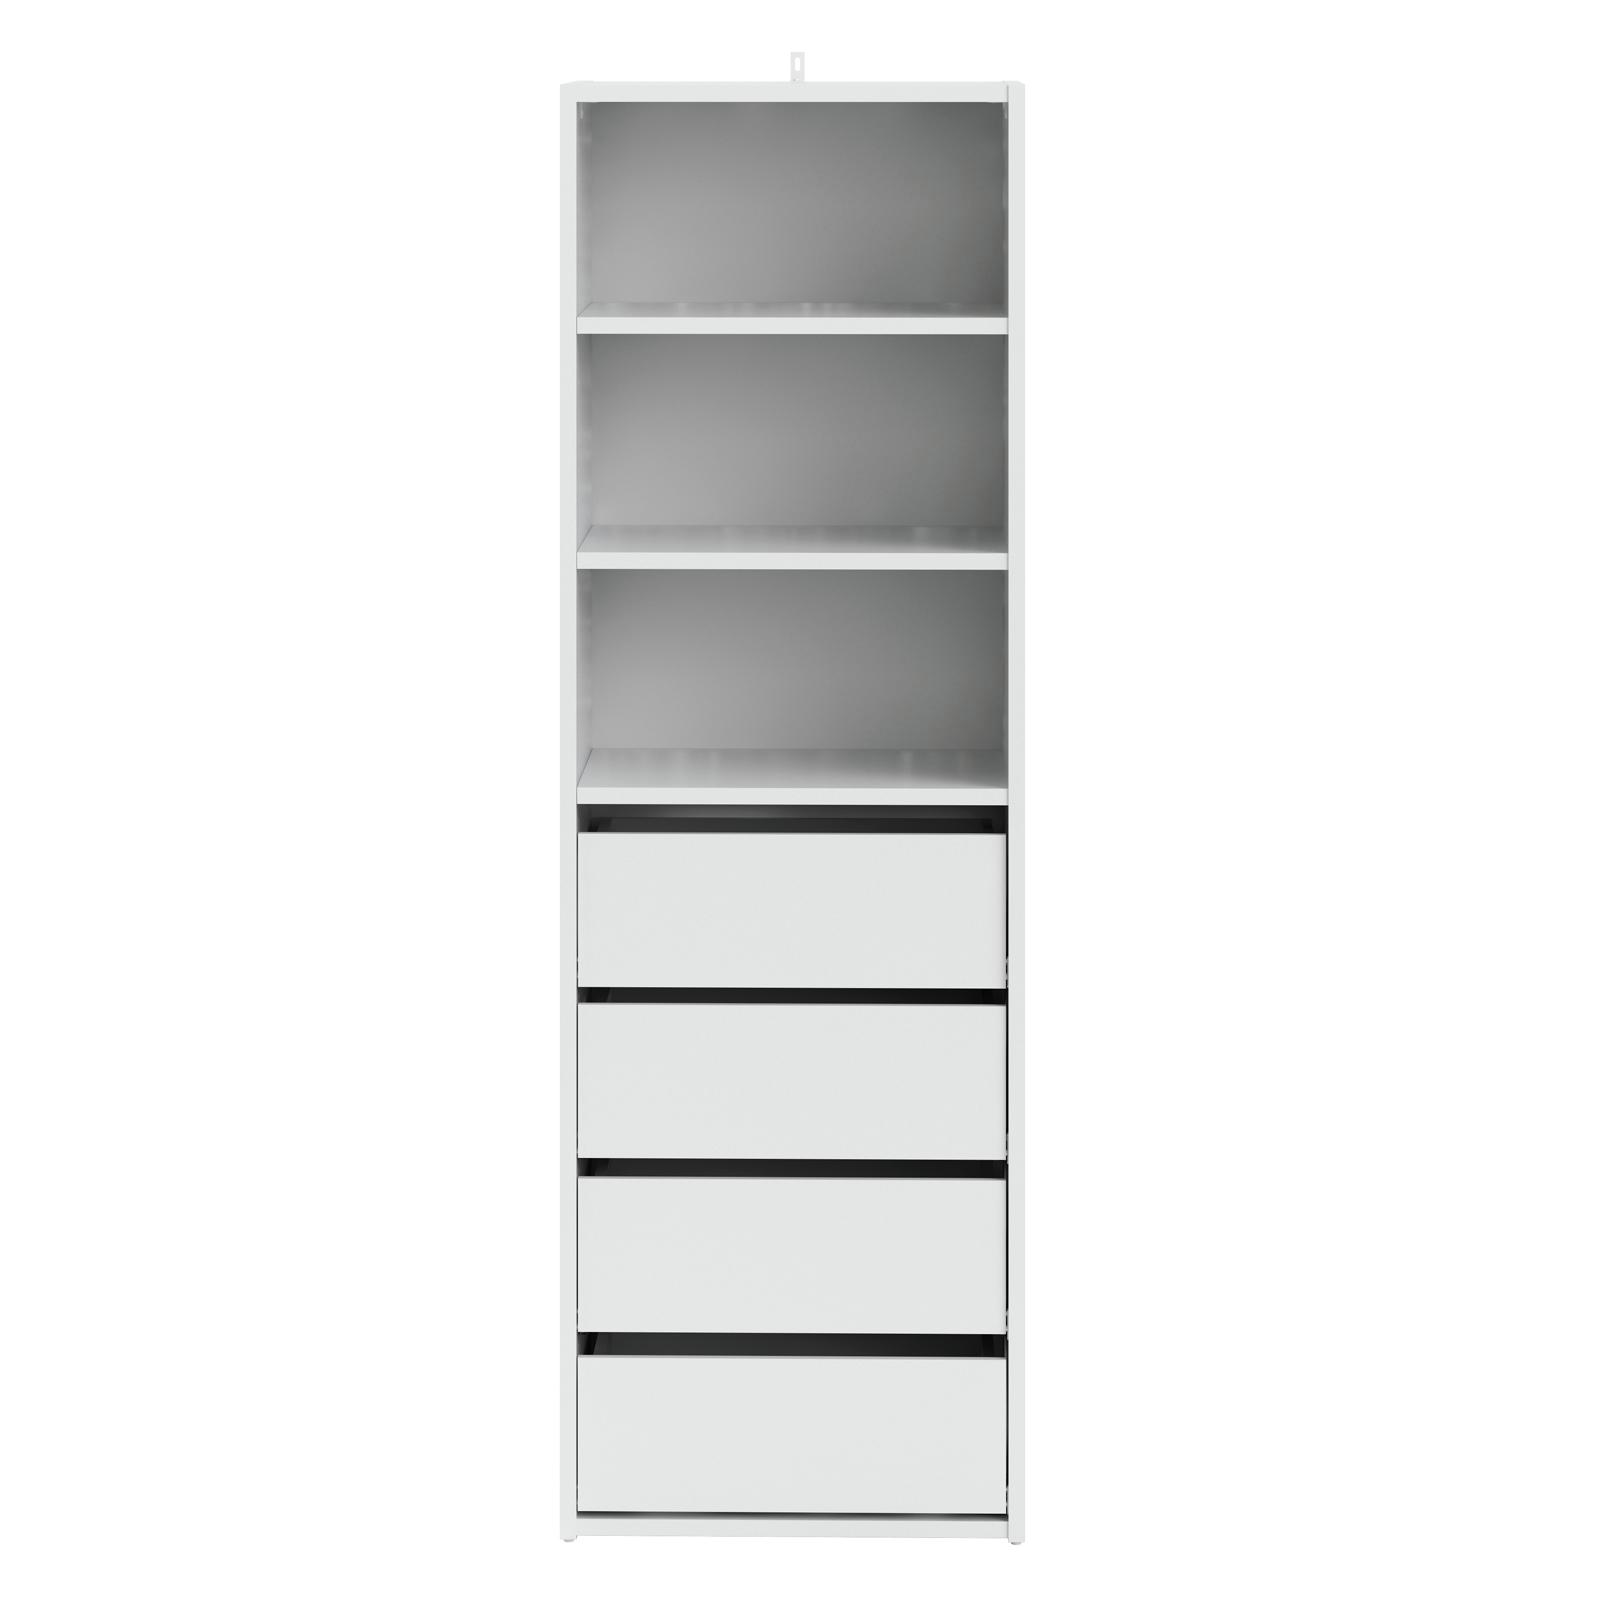 Flexi Storage White 3 Shelf 4 Drawer Built In Wardrobe Unit